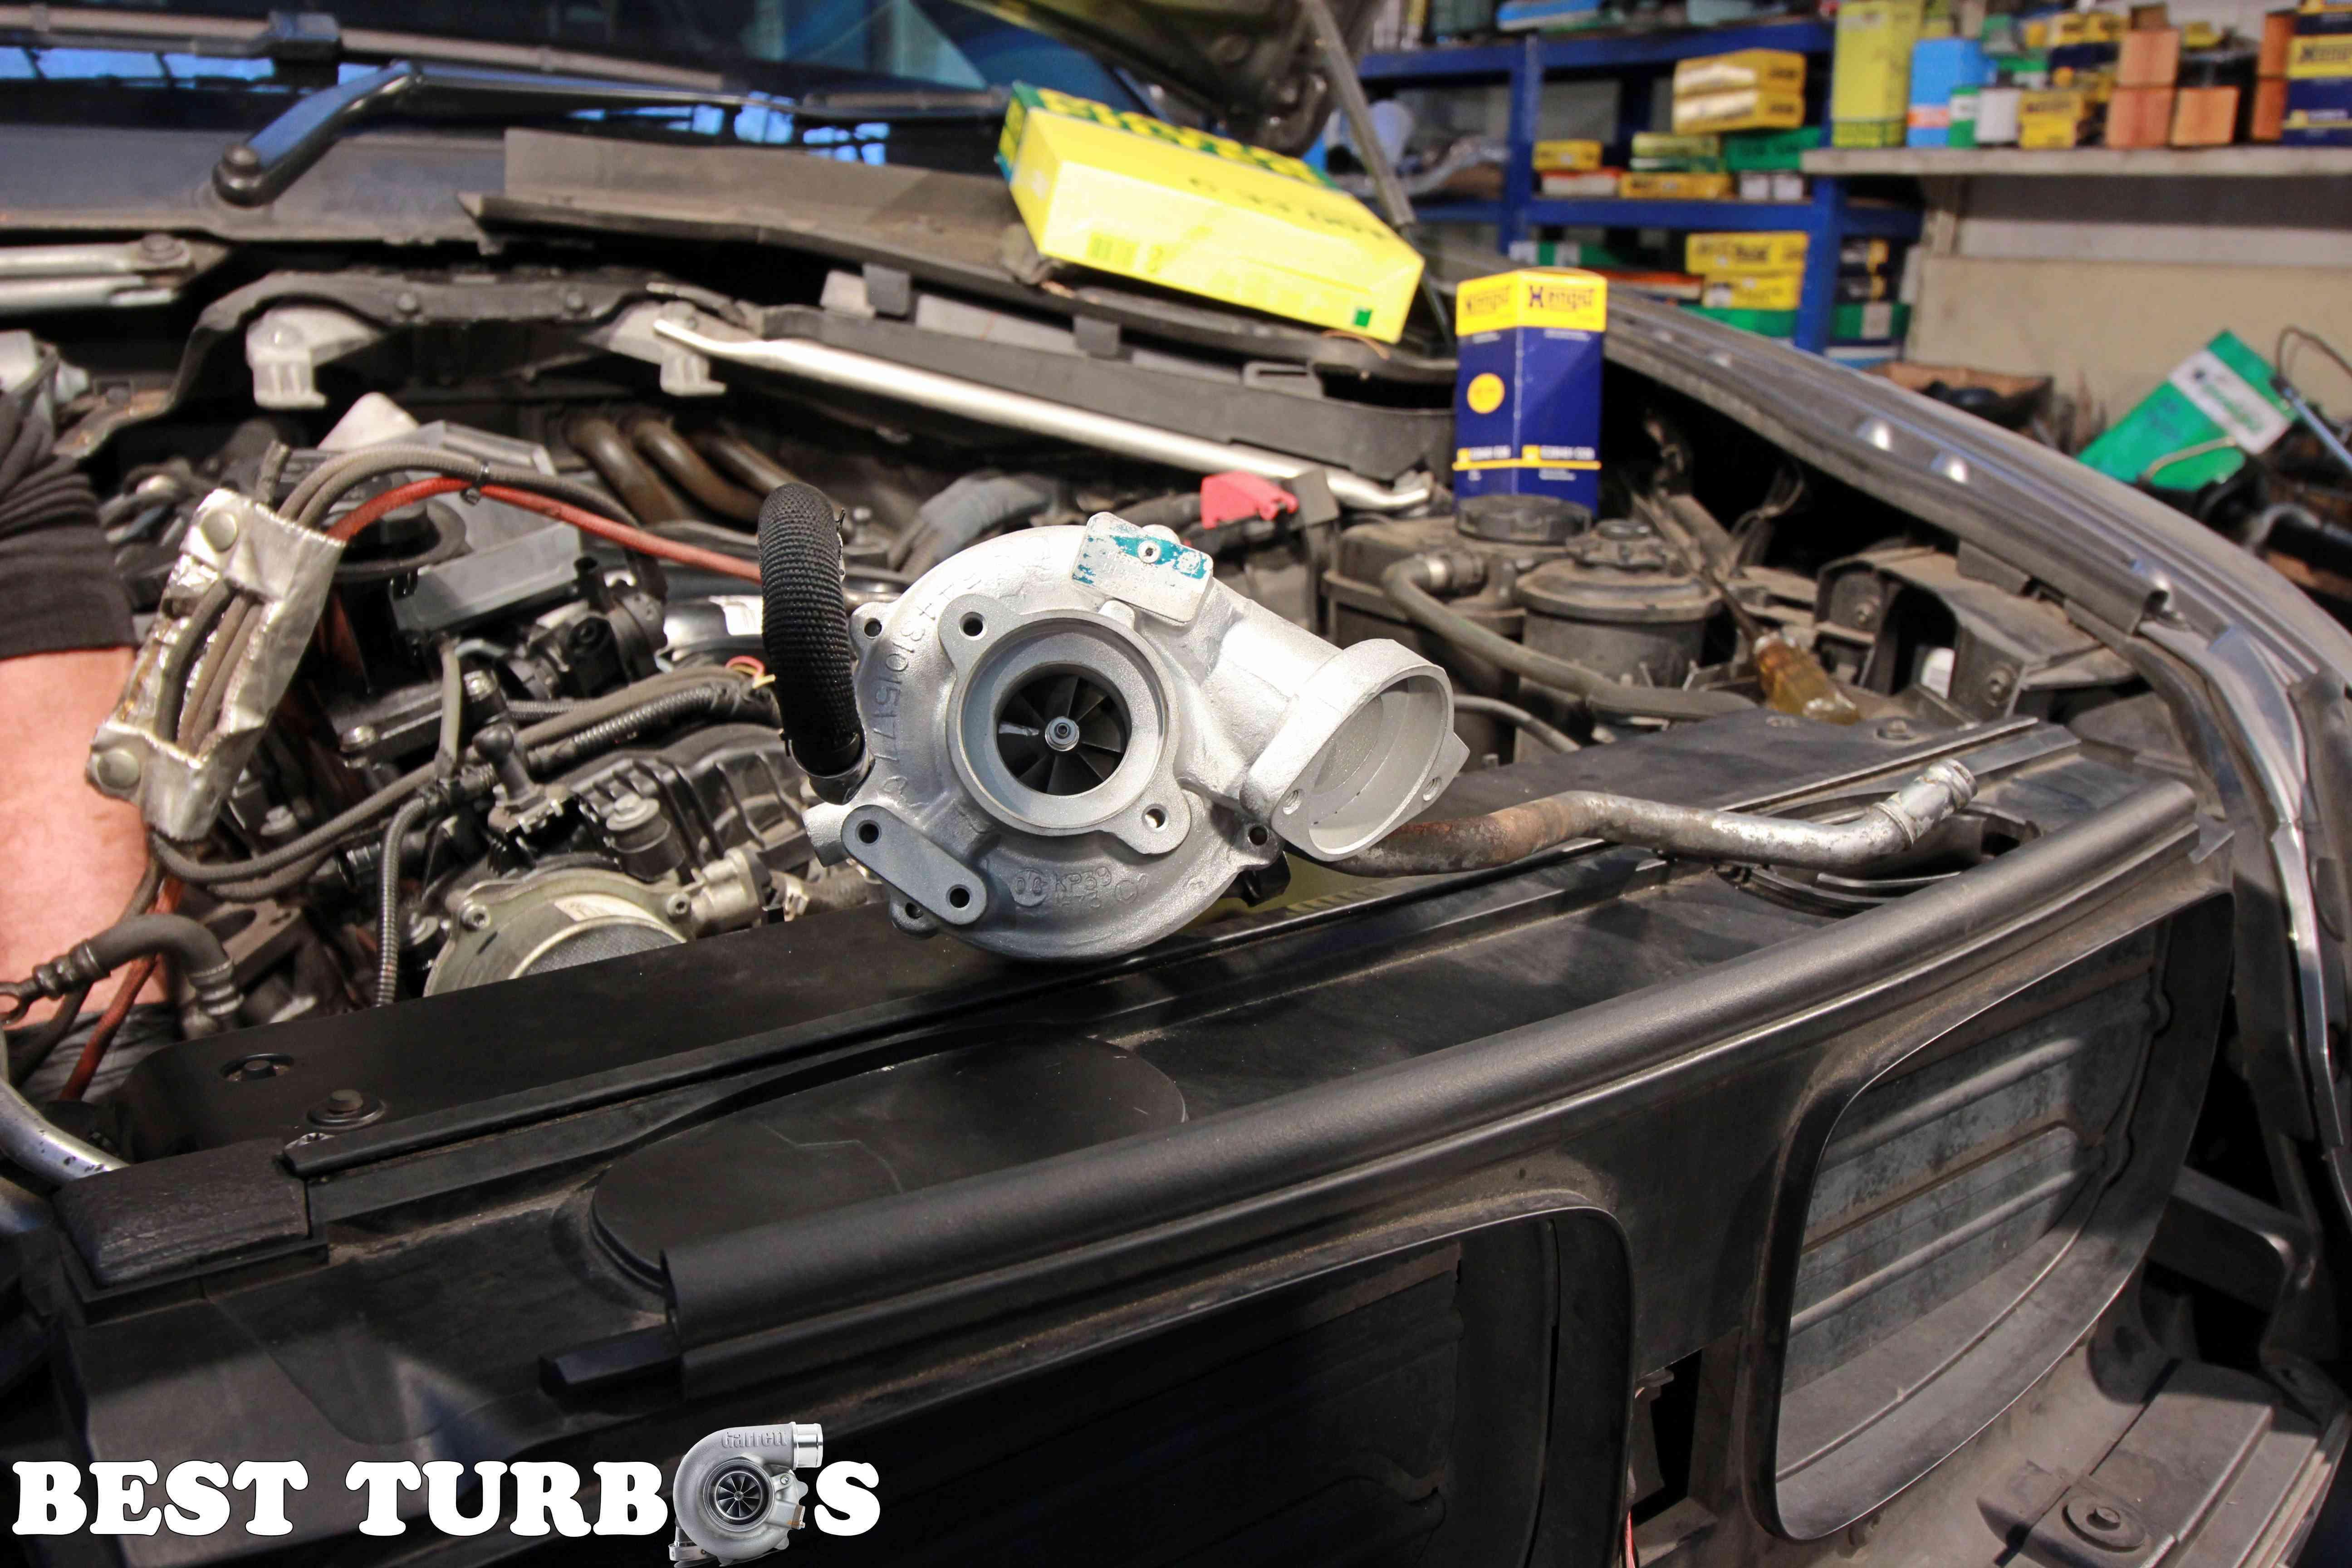 Bmw X5 35d 2009 Turbocharger Turbo Problem Reconditioning